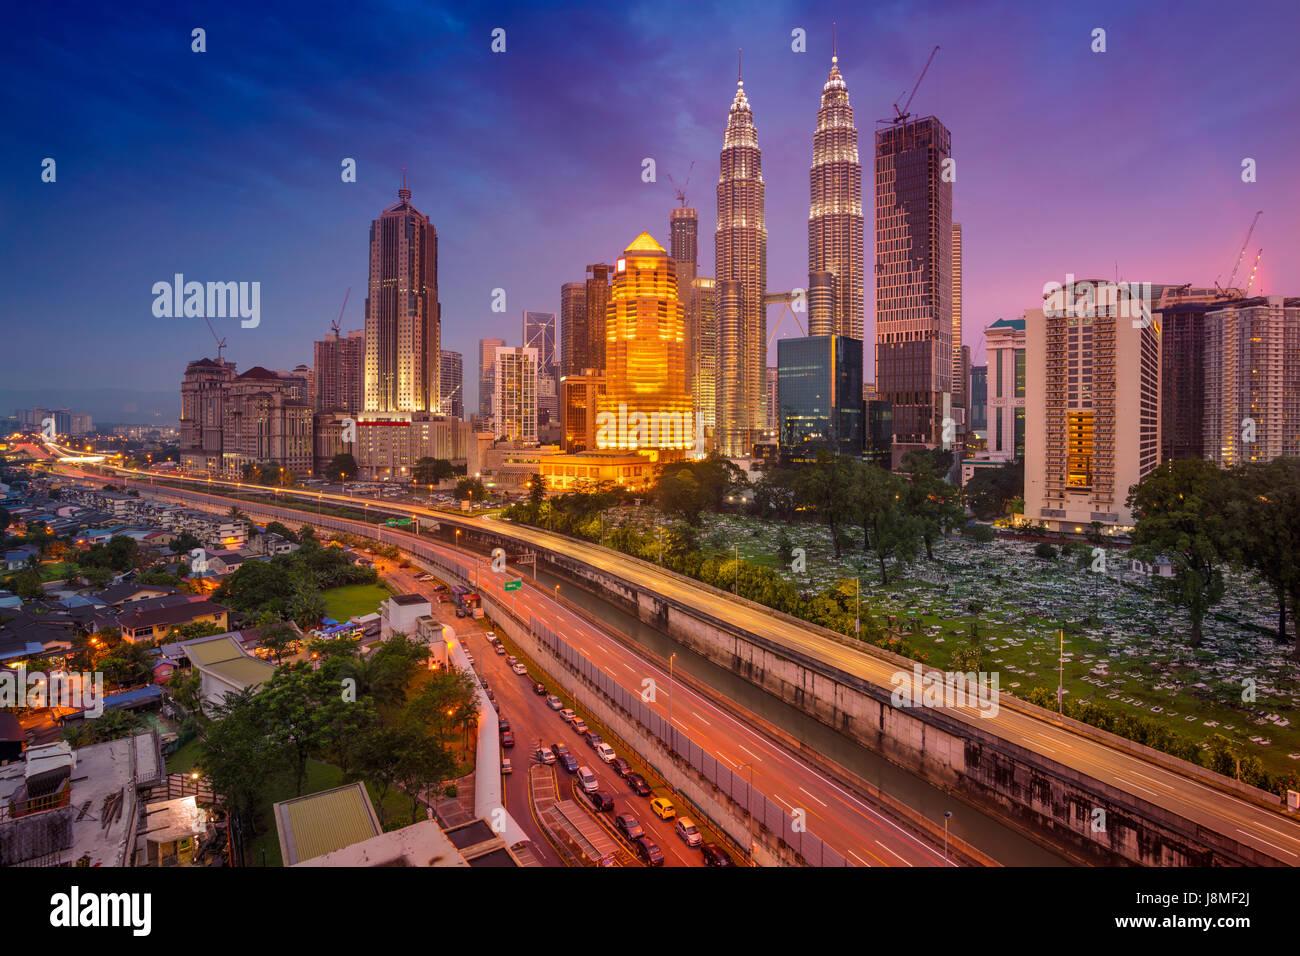 Kuala Lumpur. Cityscape image of Kuala Lumpur, Malaysia during twilight blue hour. Stock Photo